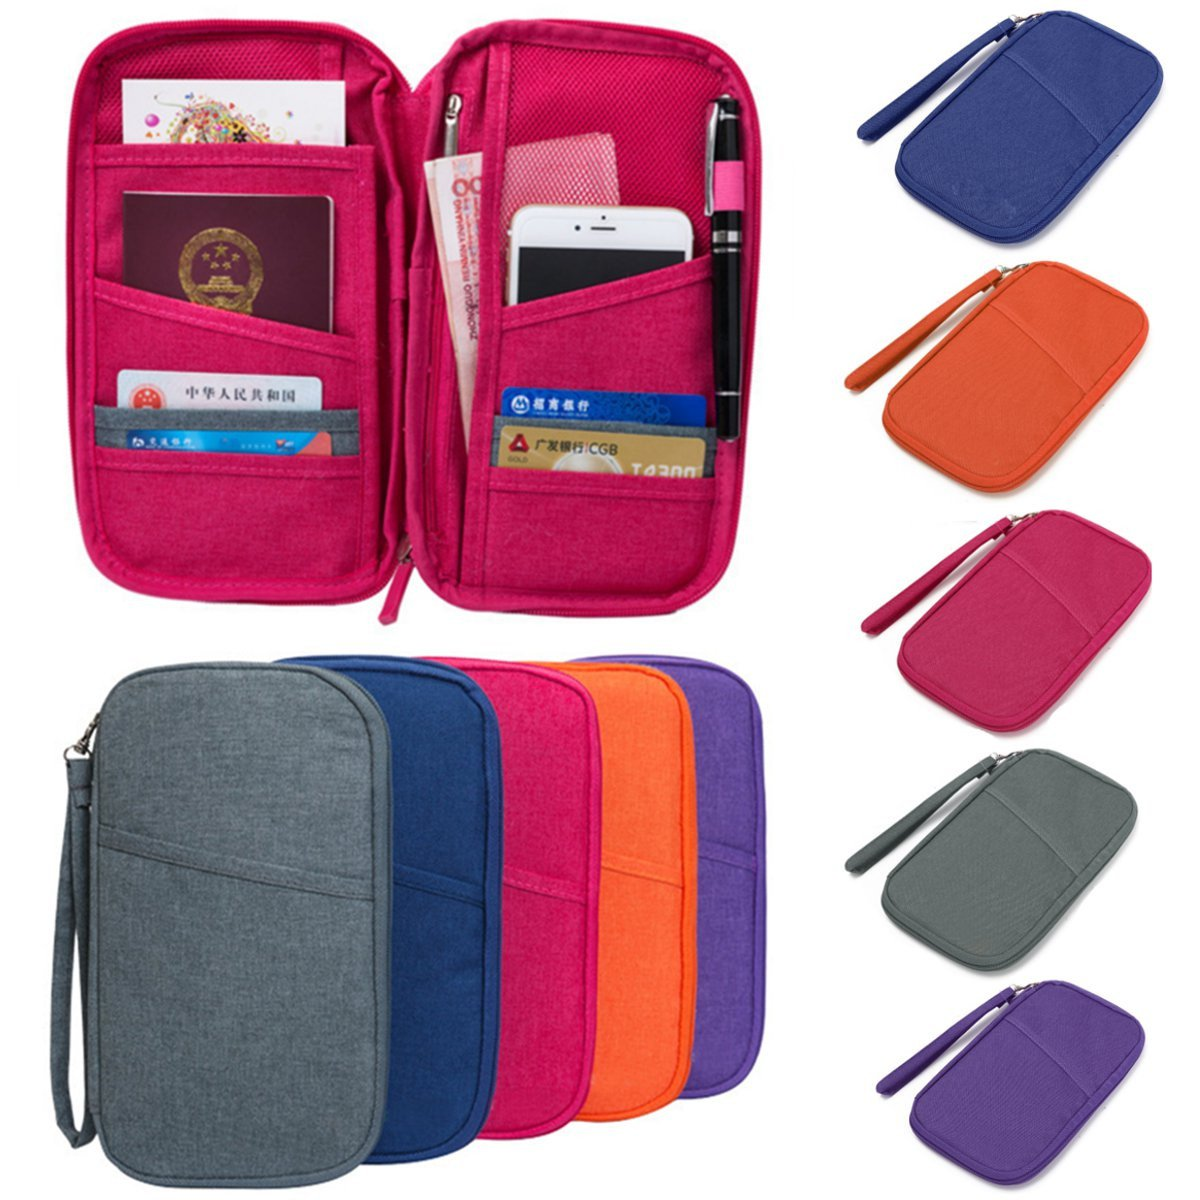 Global Brands con Online - Estuche con Brands cremallera para guardar bolígrafos, tarjetas de crédito, tarjetas de crédito, tarjetas de crédito, cartera, maquillaje, etc. b70eb8